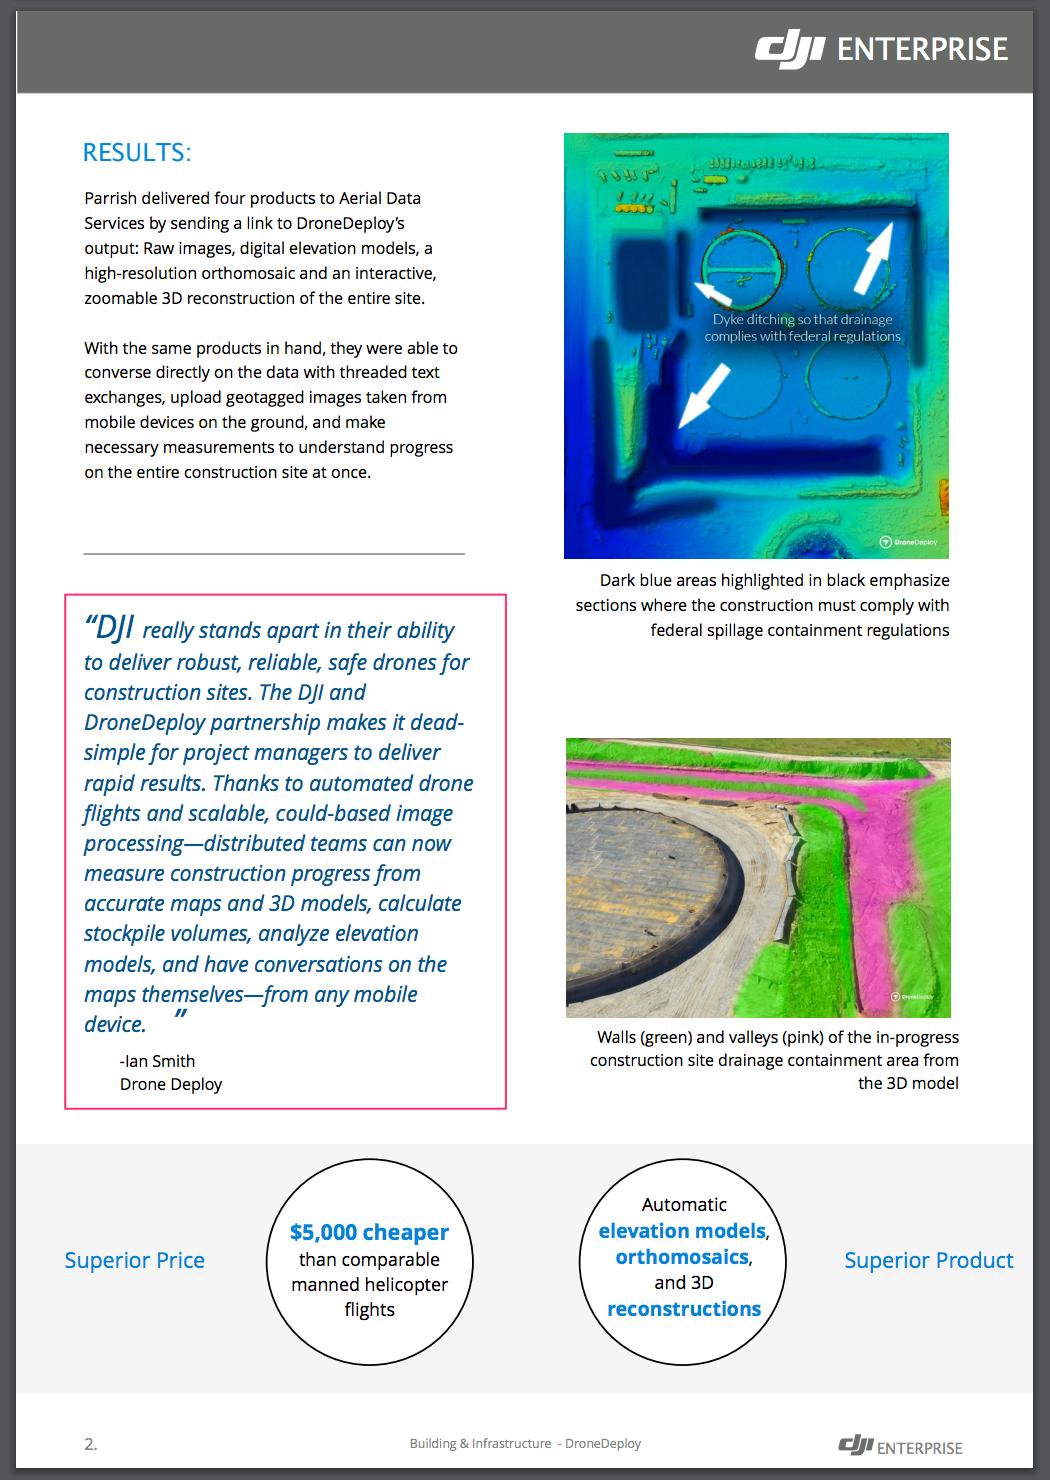 DJI's Enterprise website—drones in construction case study